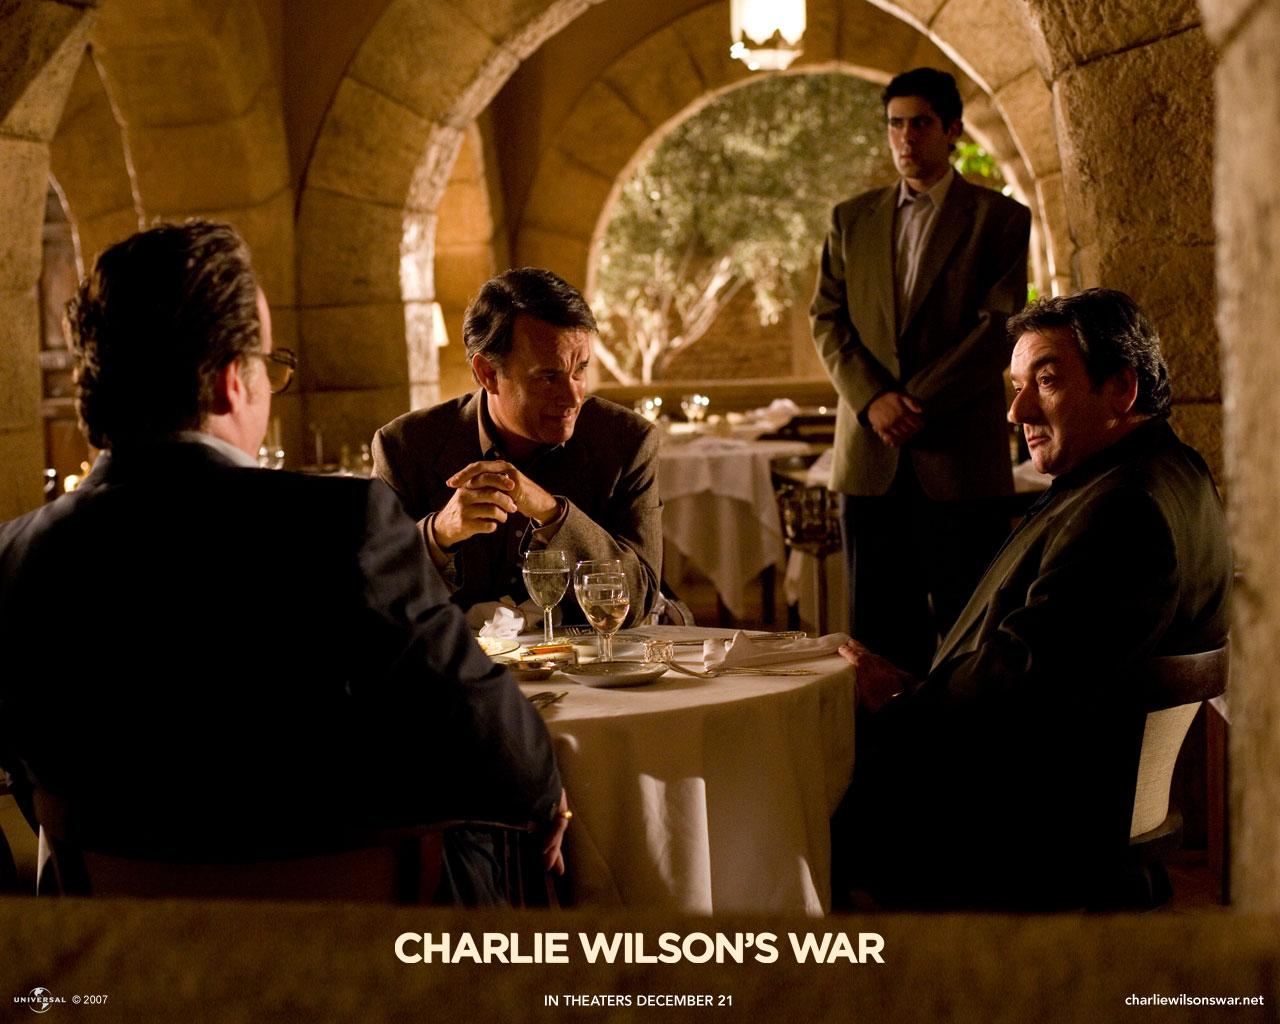 Charlie Wilson's War | Free Desktop Wallpapers for HD